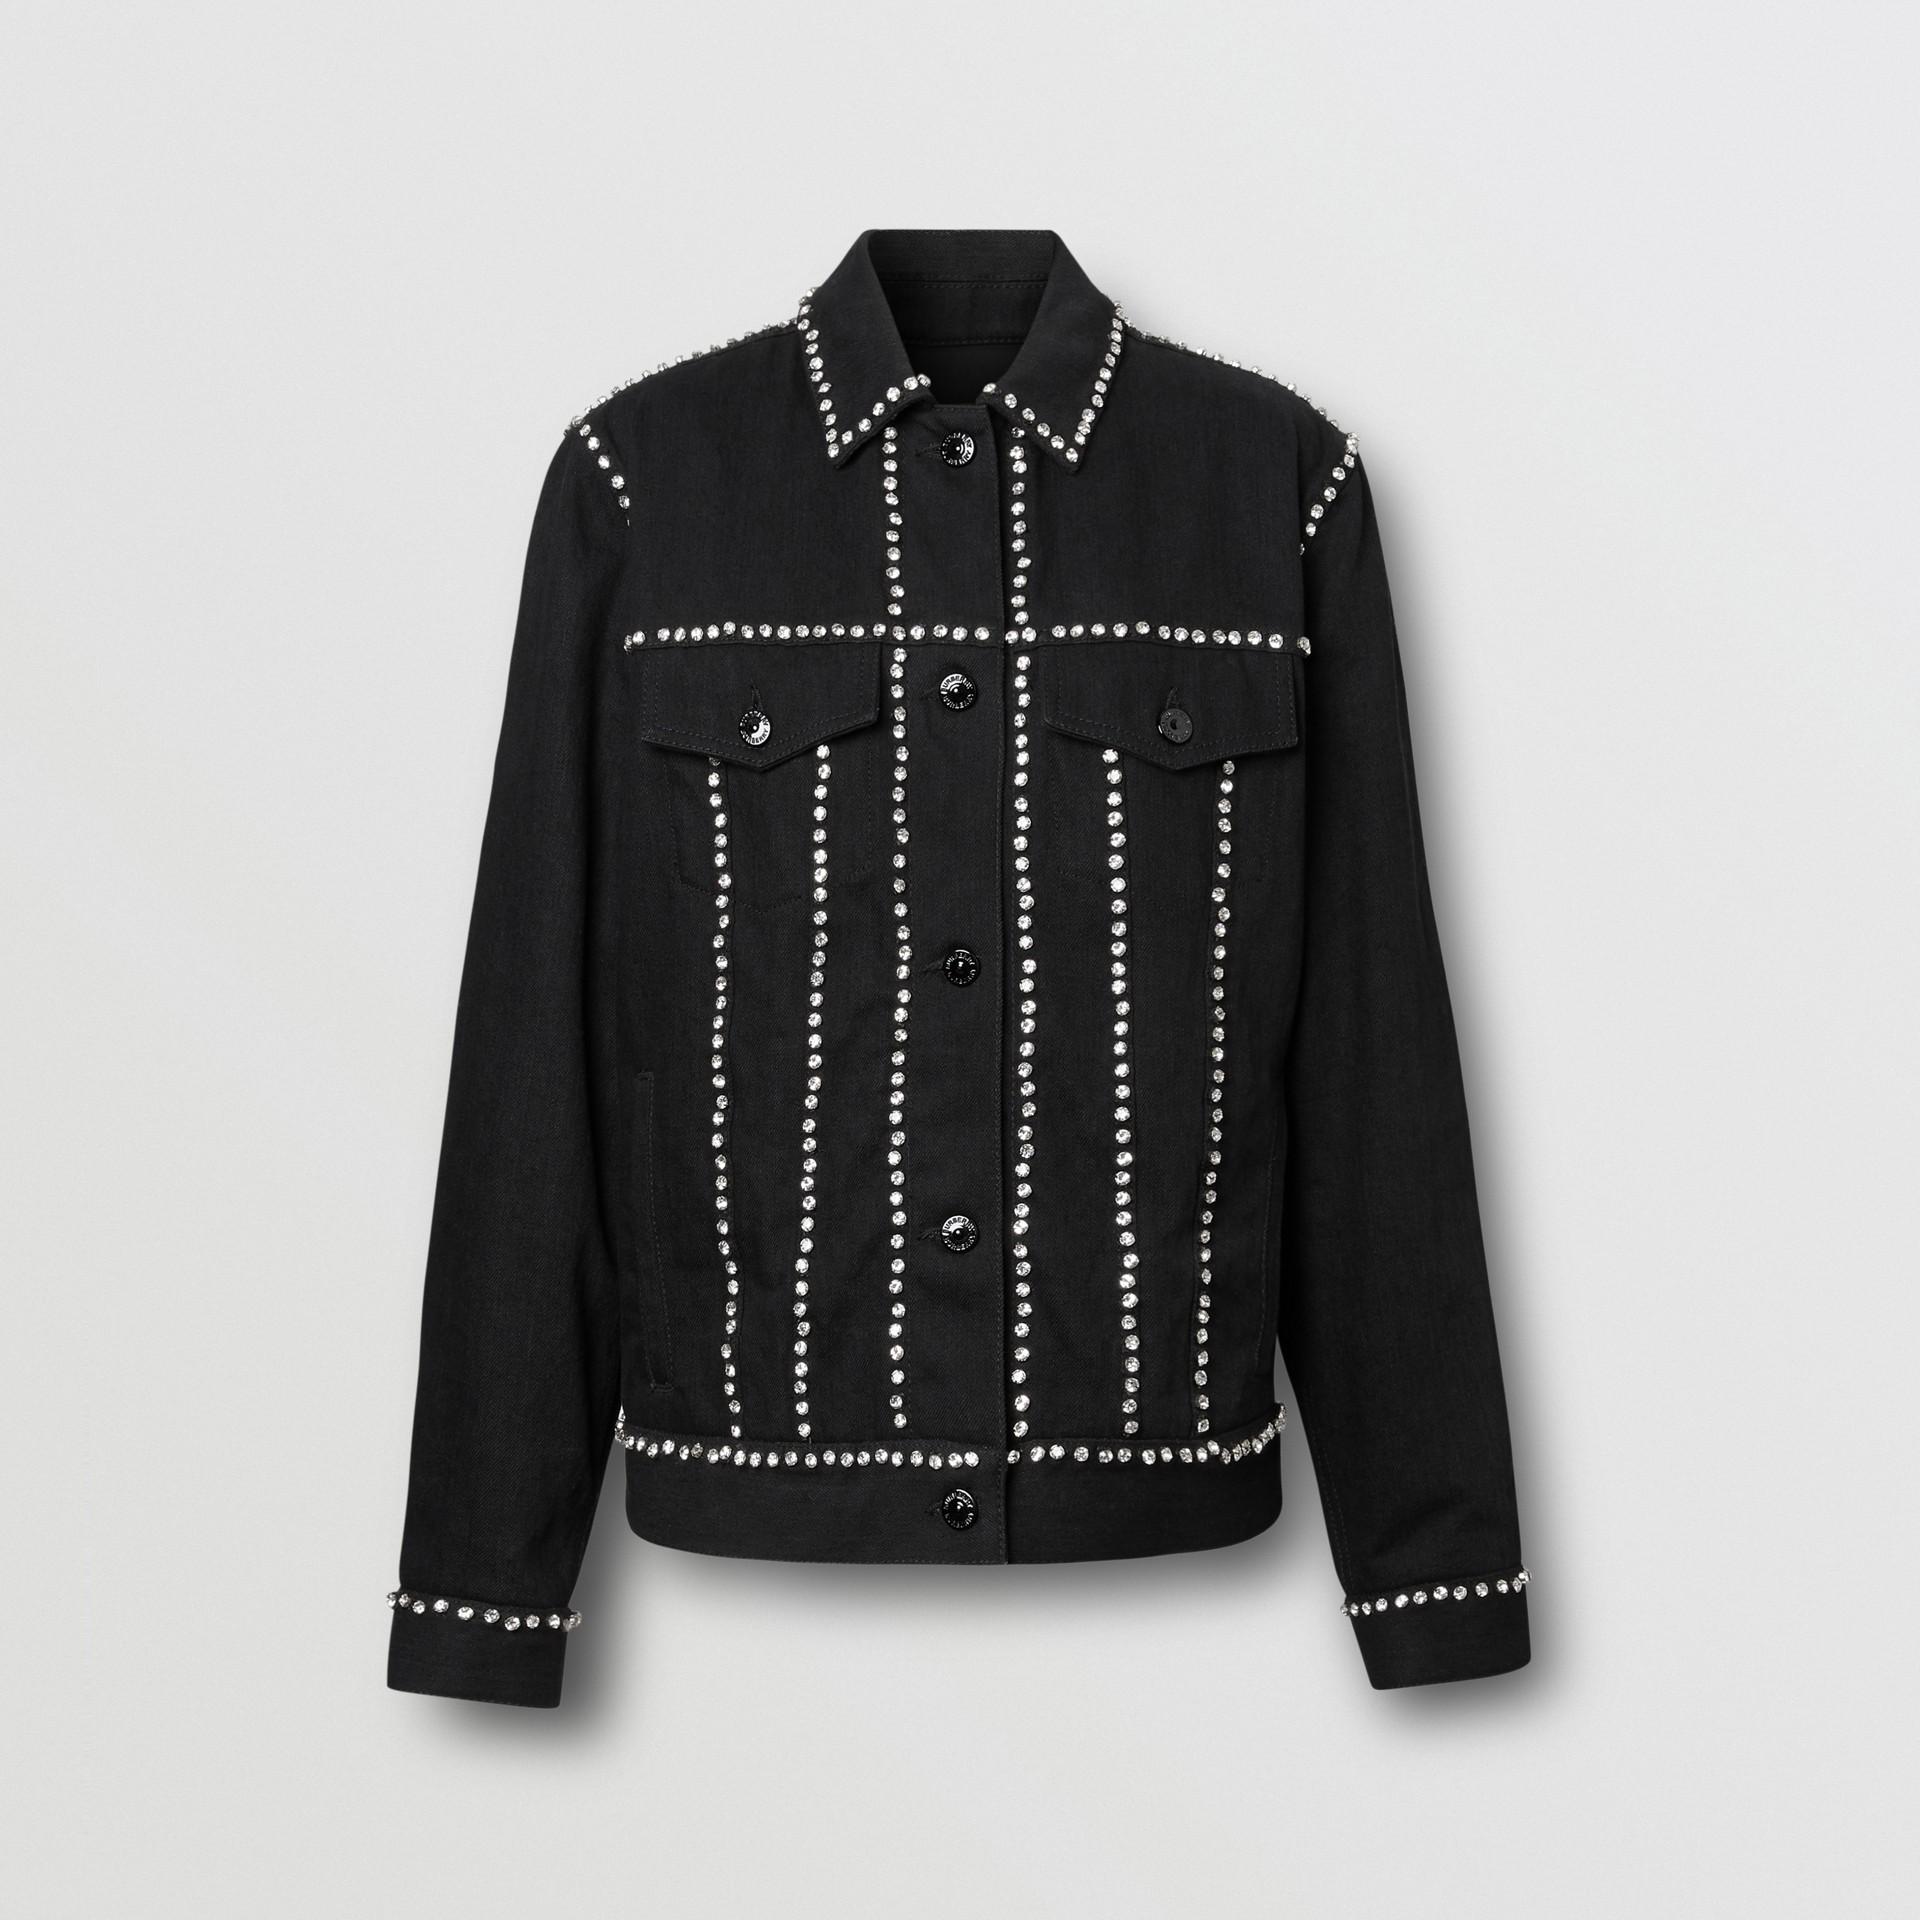 Crystal Logo Detail Japanese Denim Jacket in Black - Women | Burberry United Kingdom - gallery image 3